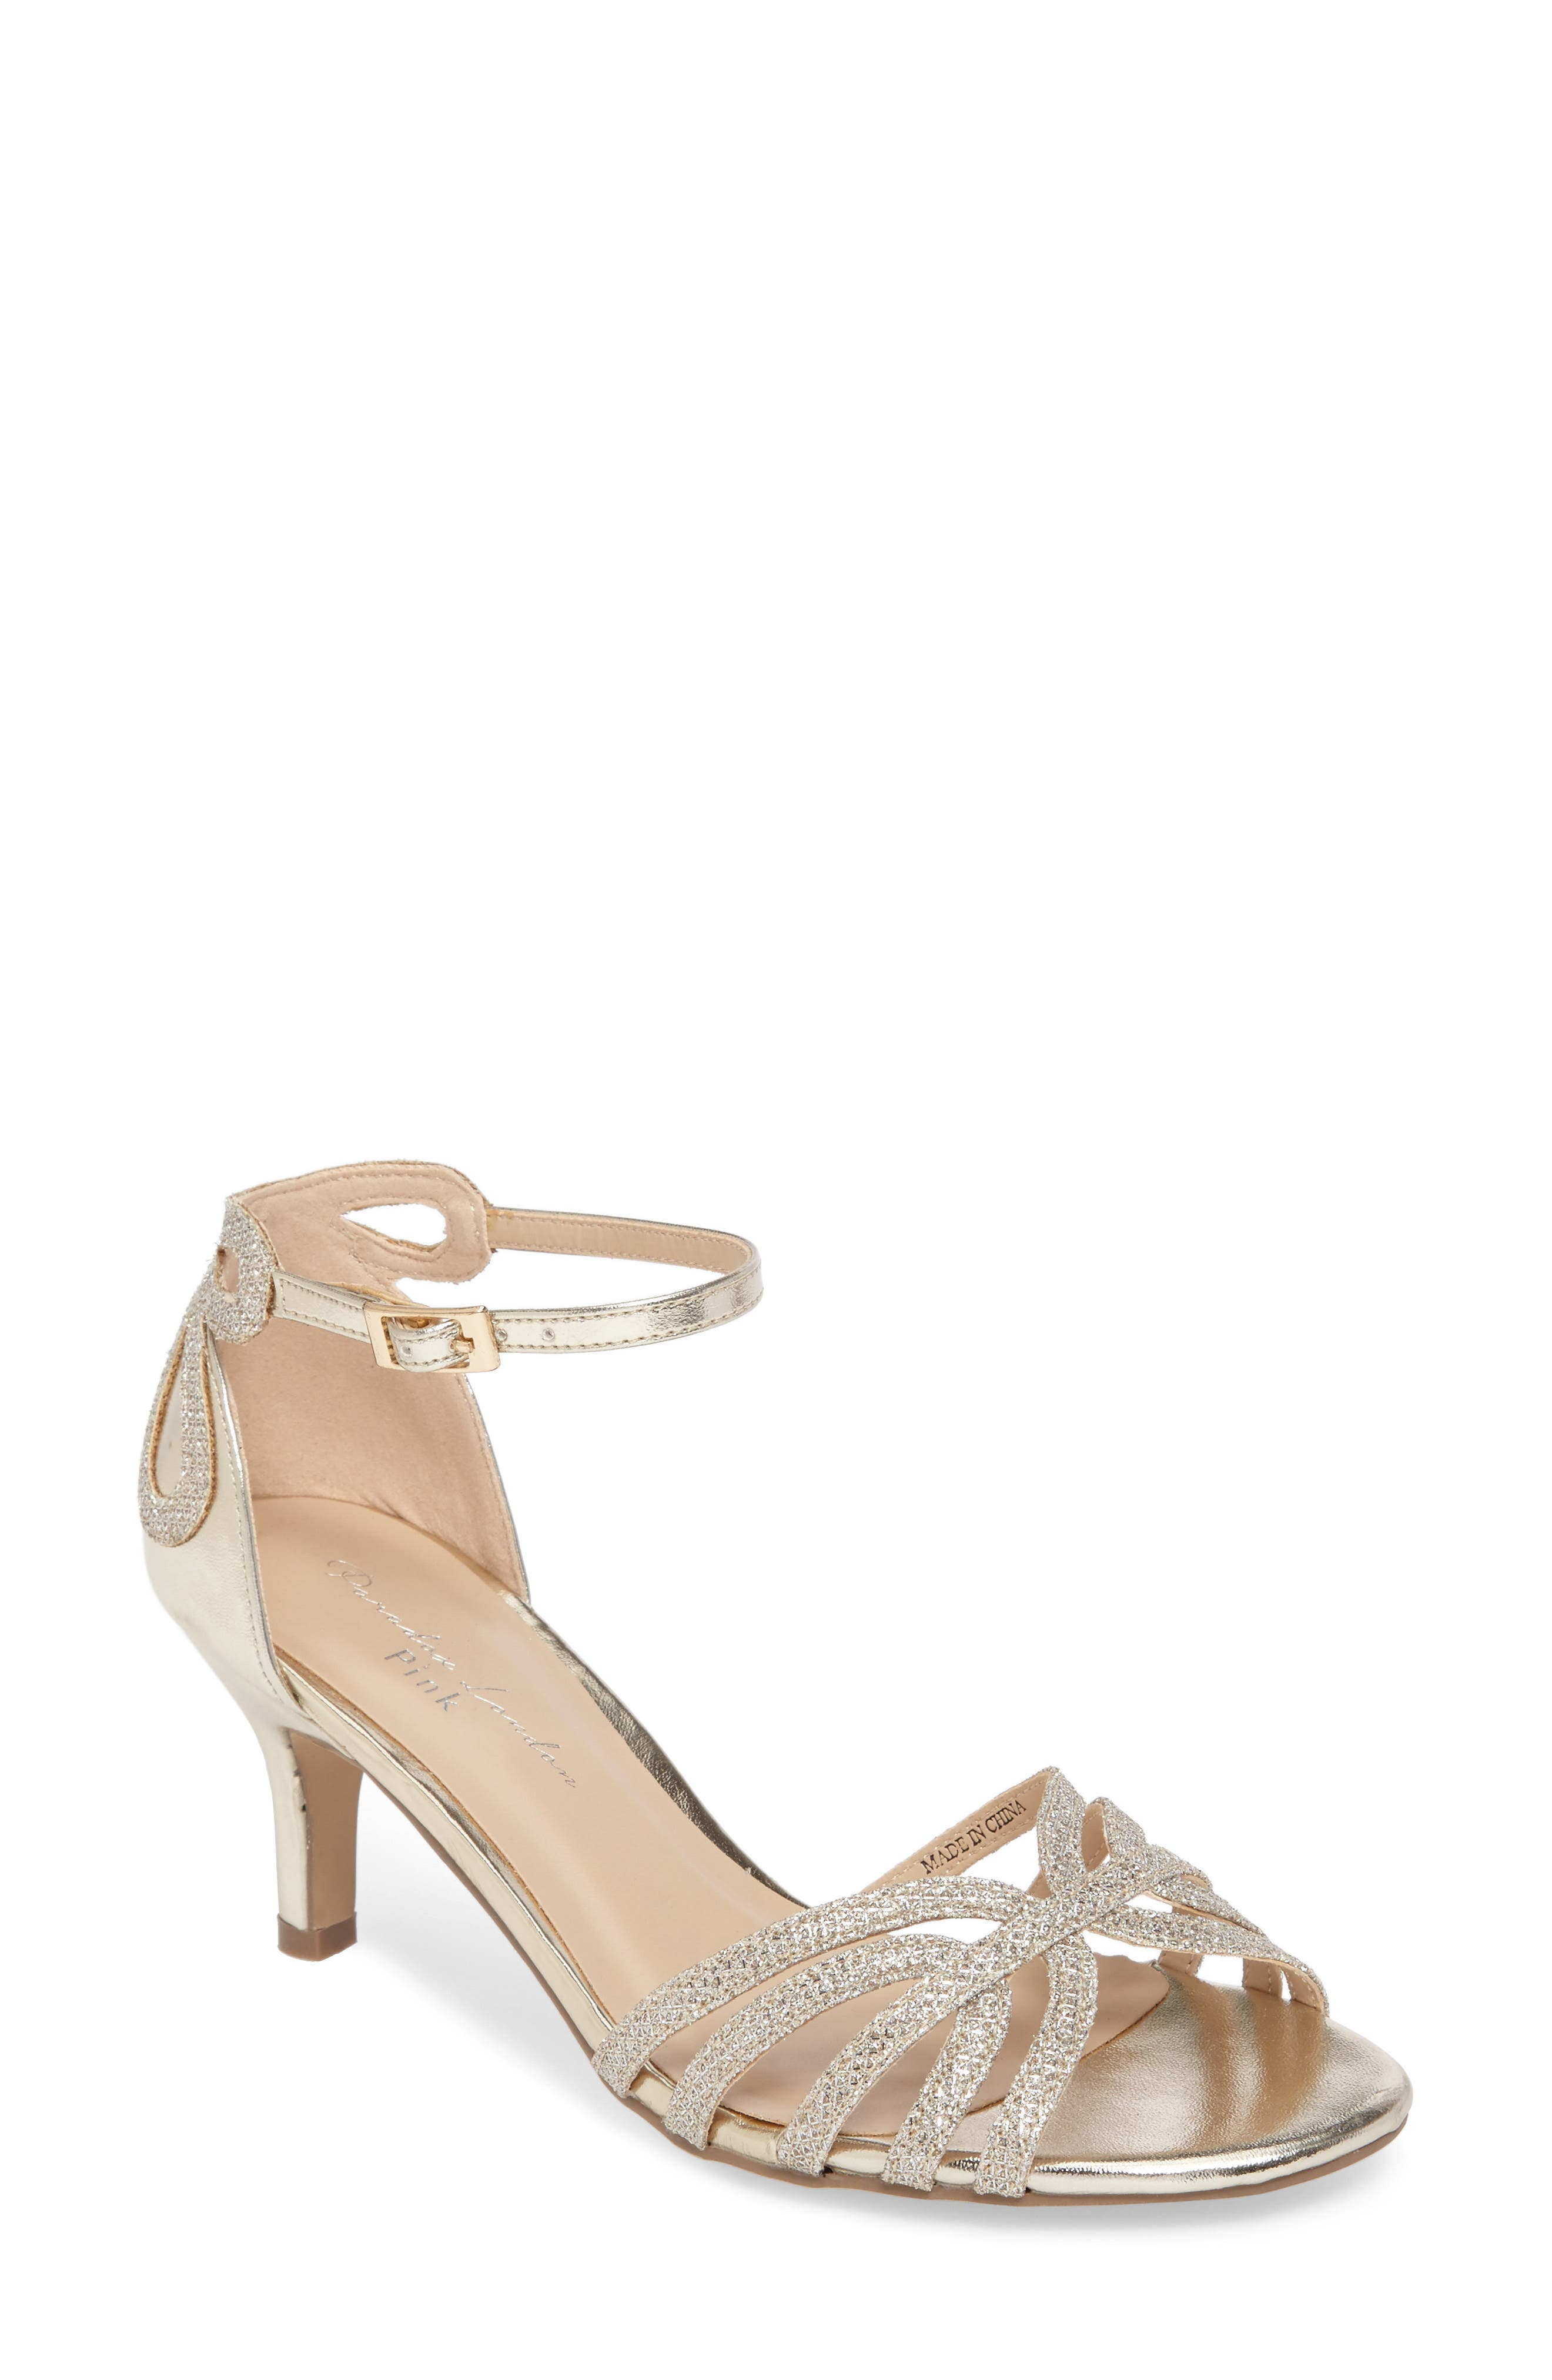 Melby Ankle Strap Sandal,                             Main thumbnail 1, color,                             Champagne